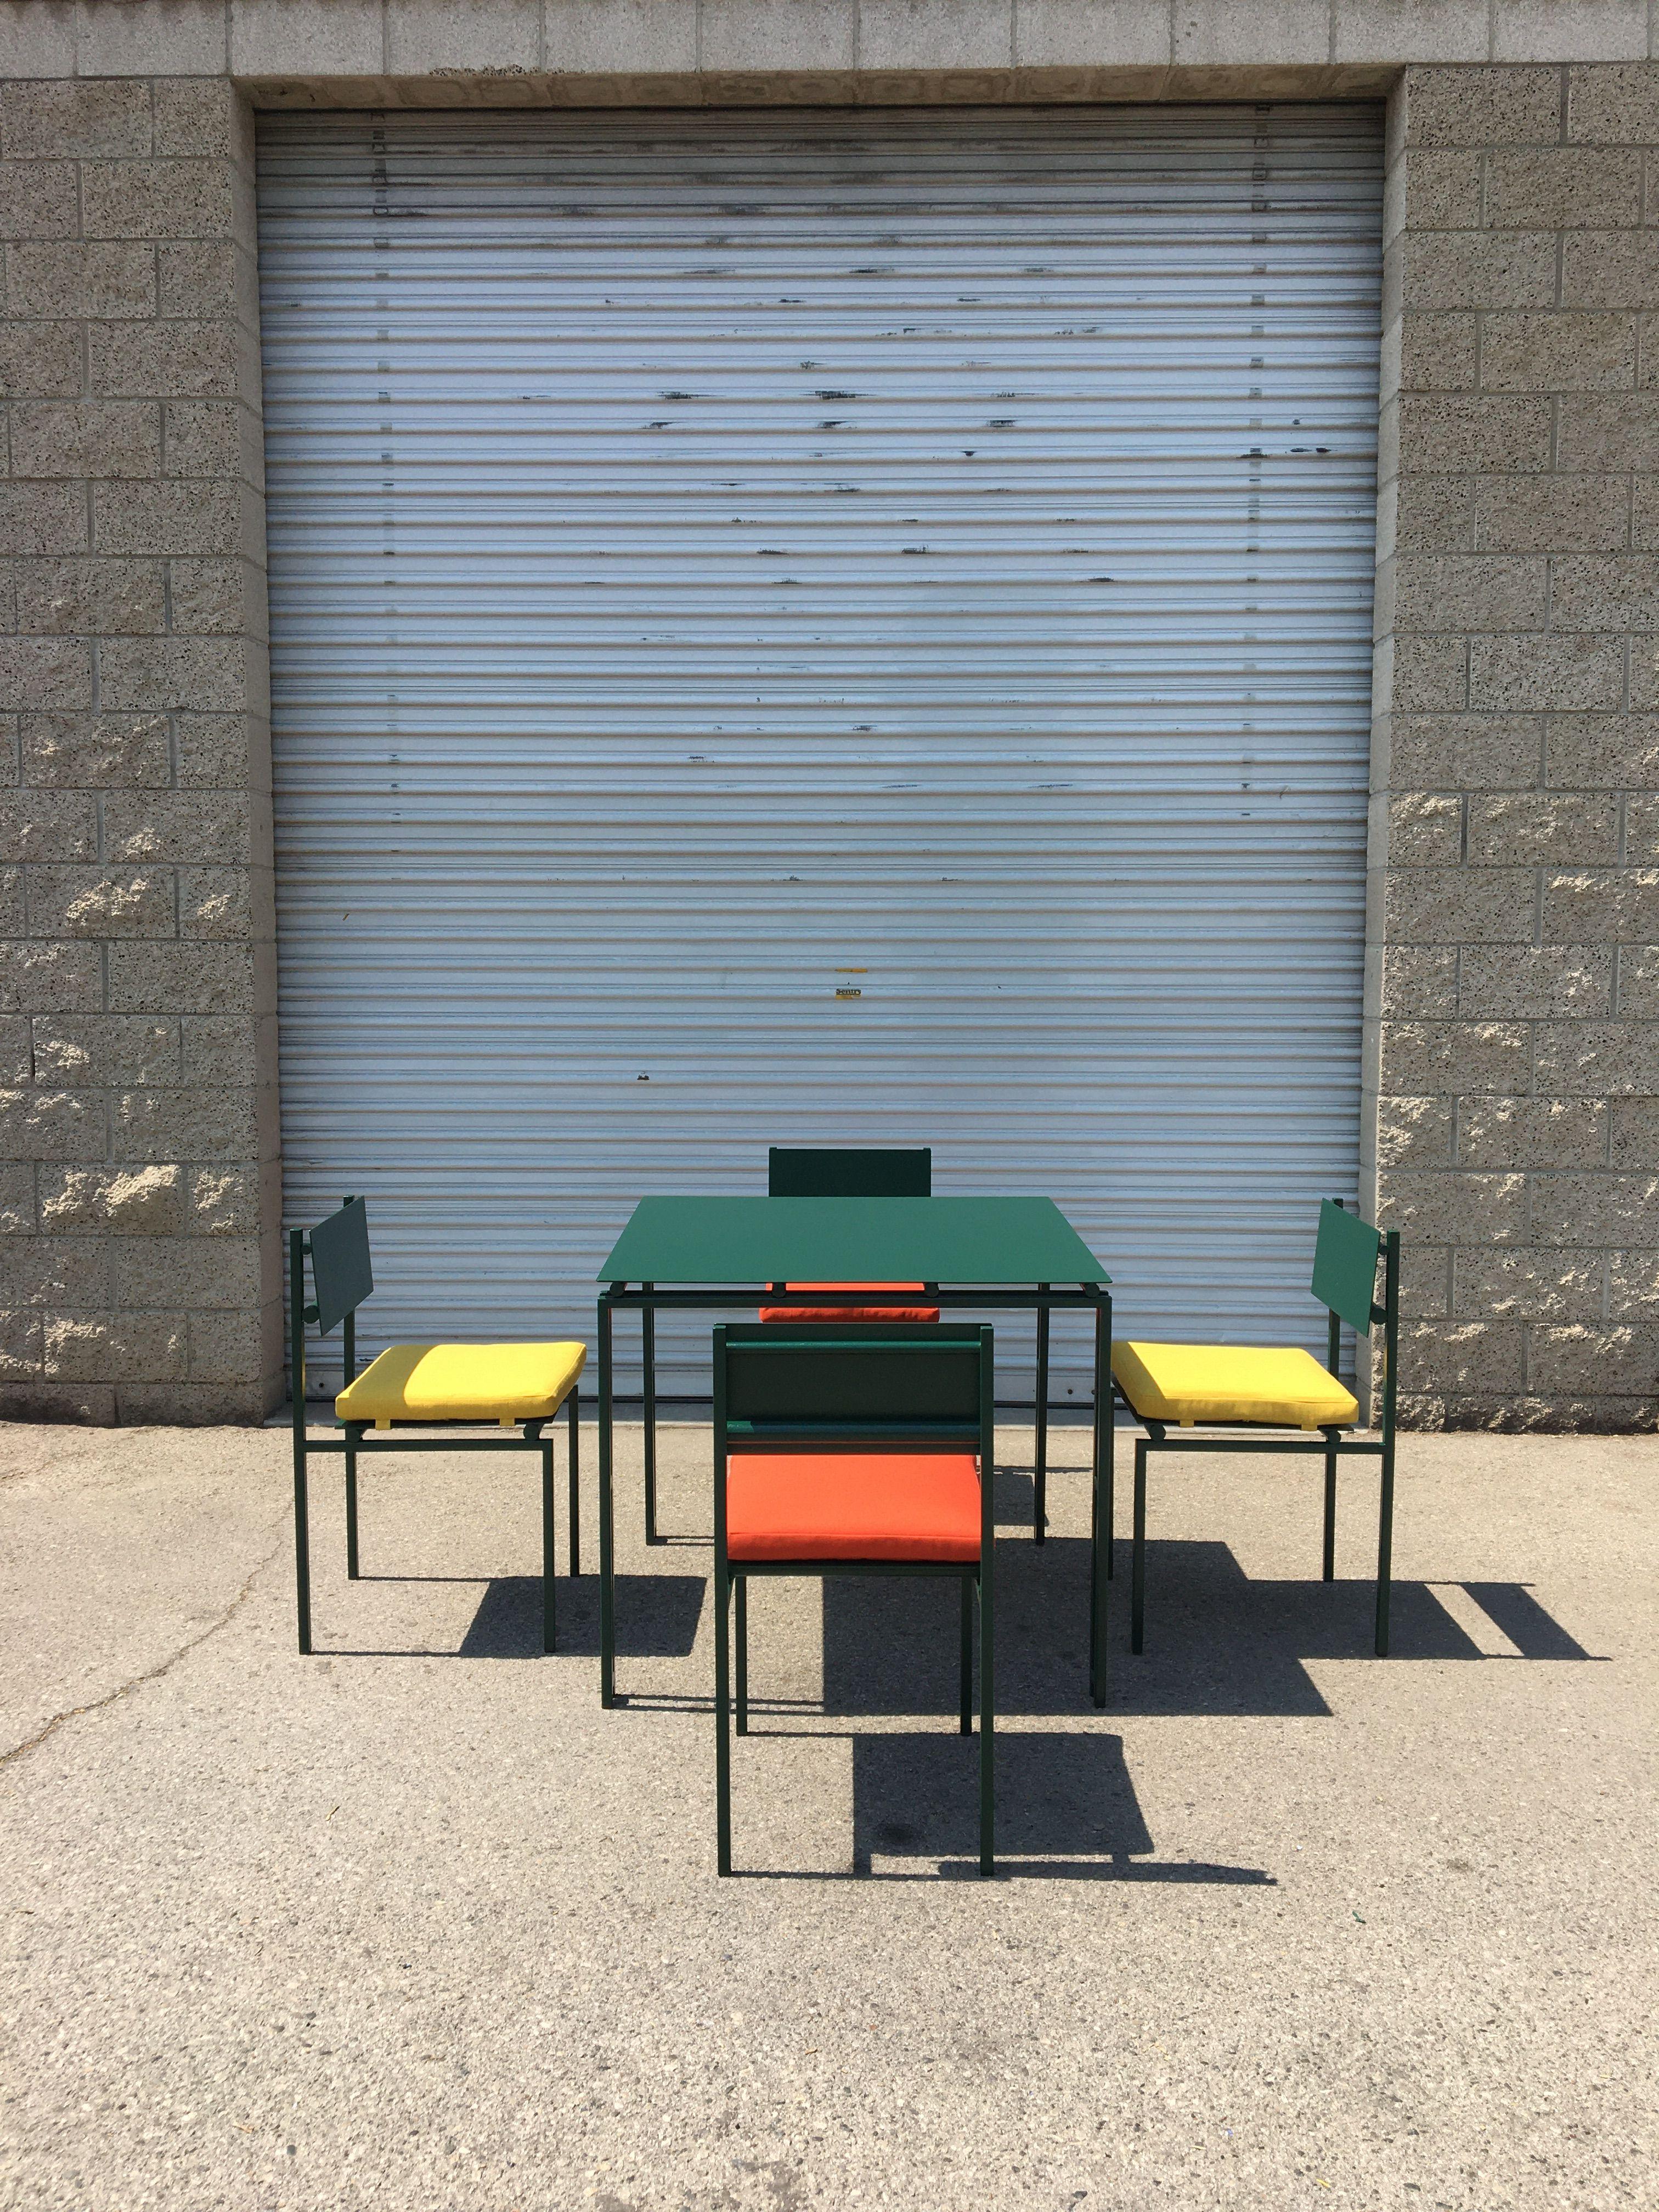 Suspension Metal Set - Breakfast Size product image 0